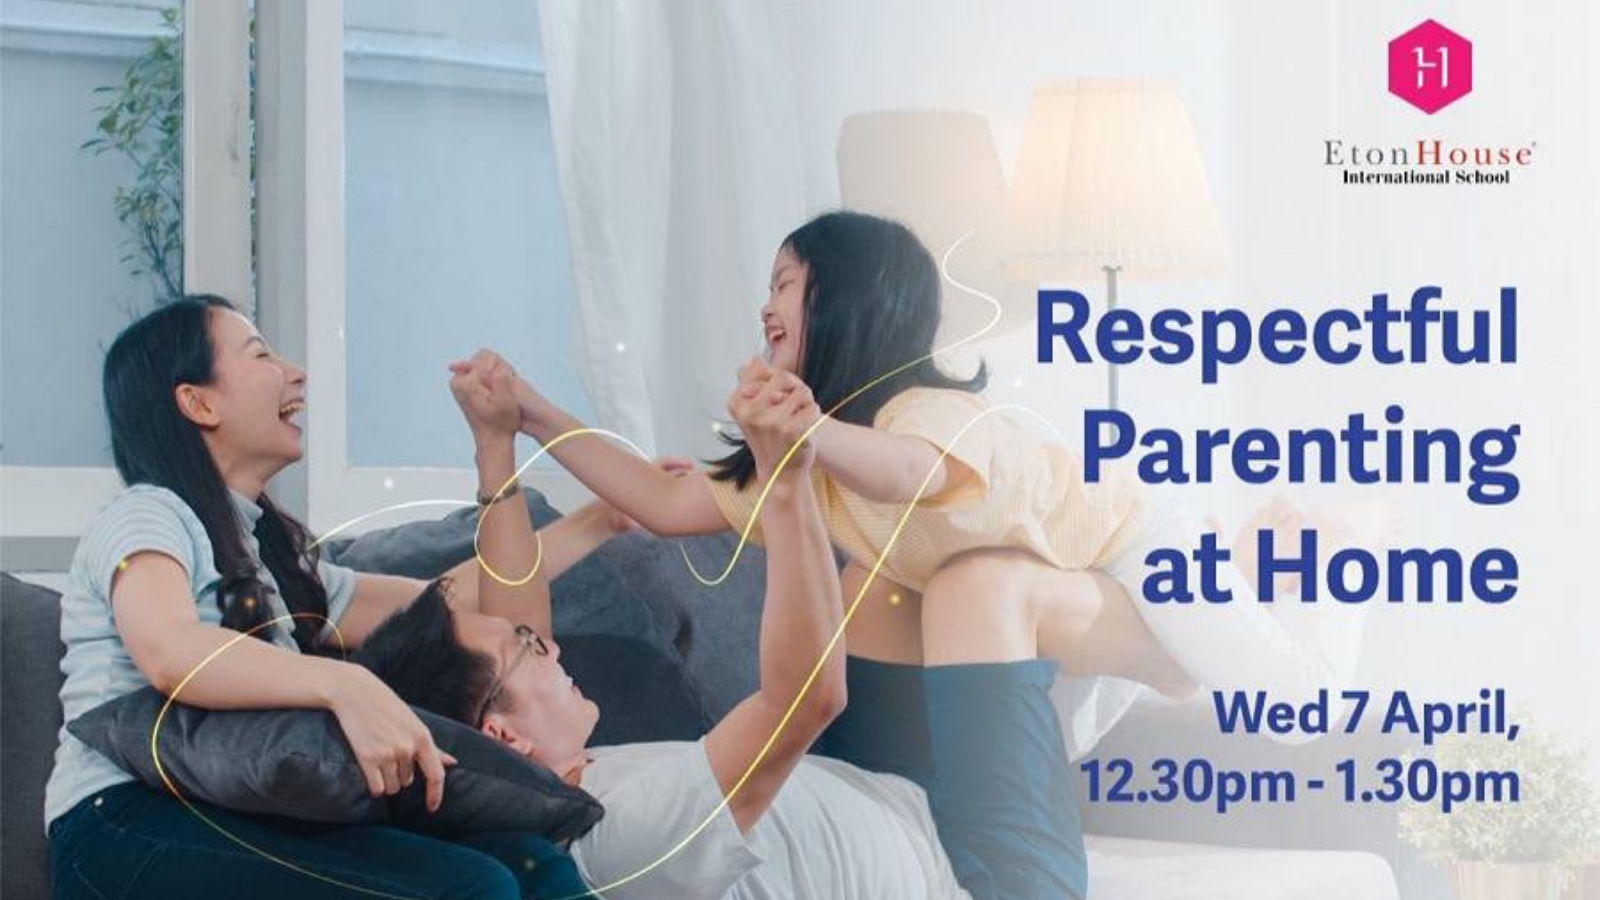 EtonHouse International x HoneyKids Talks: Respectful Parenting at Home